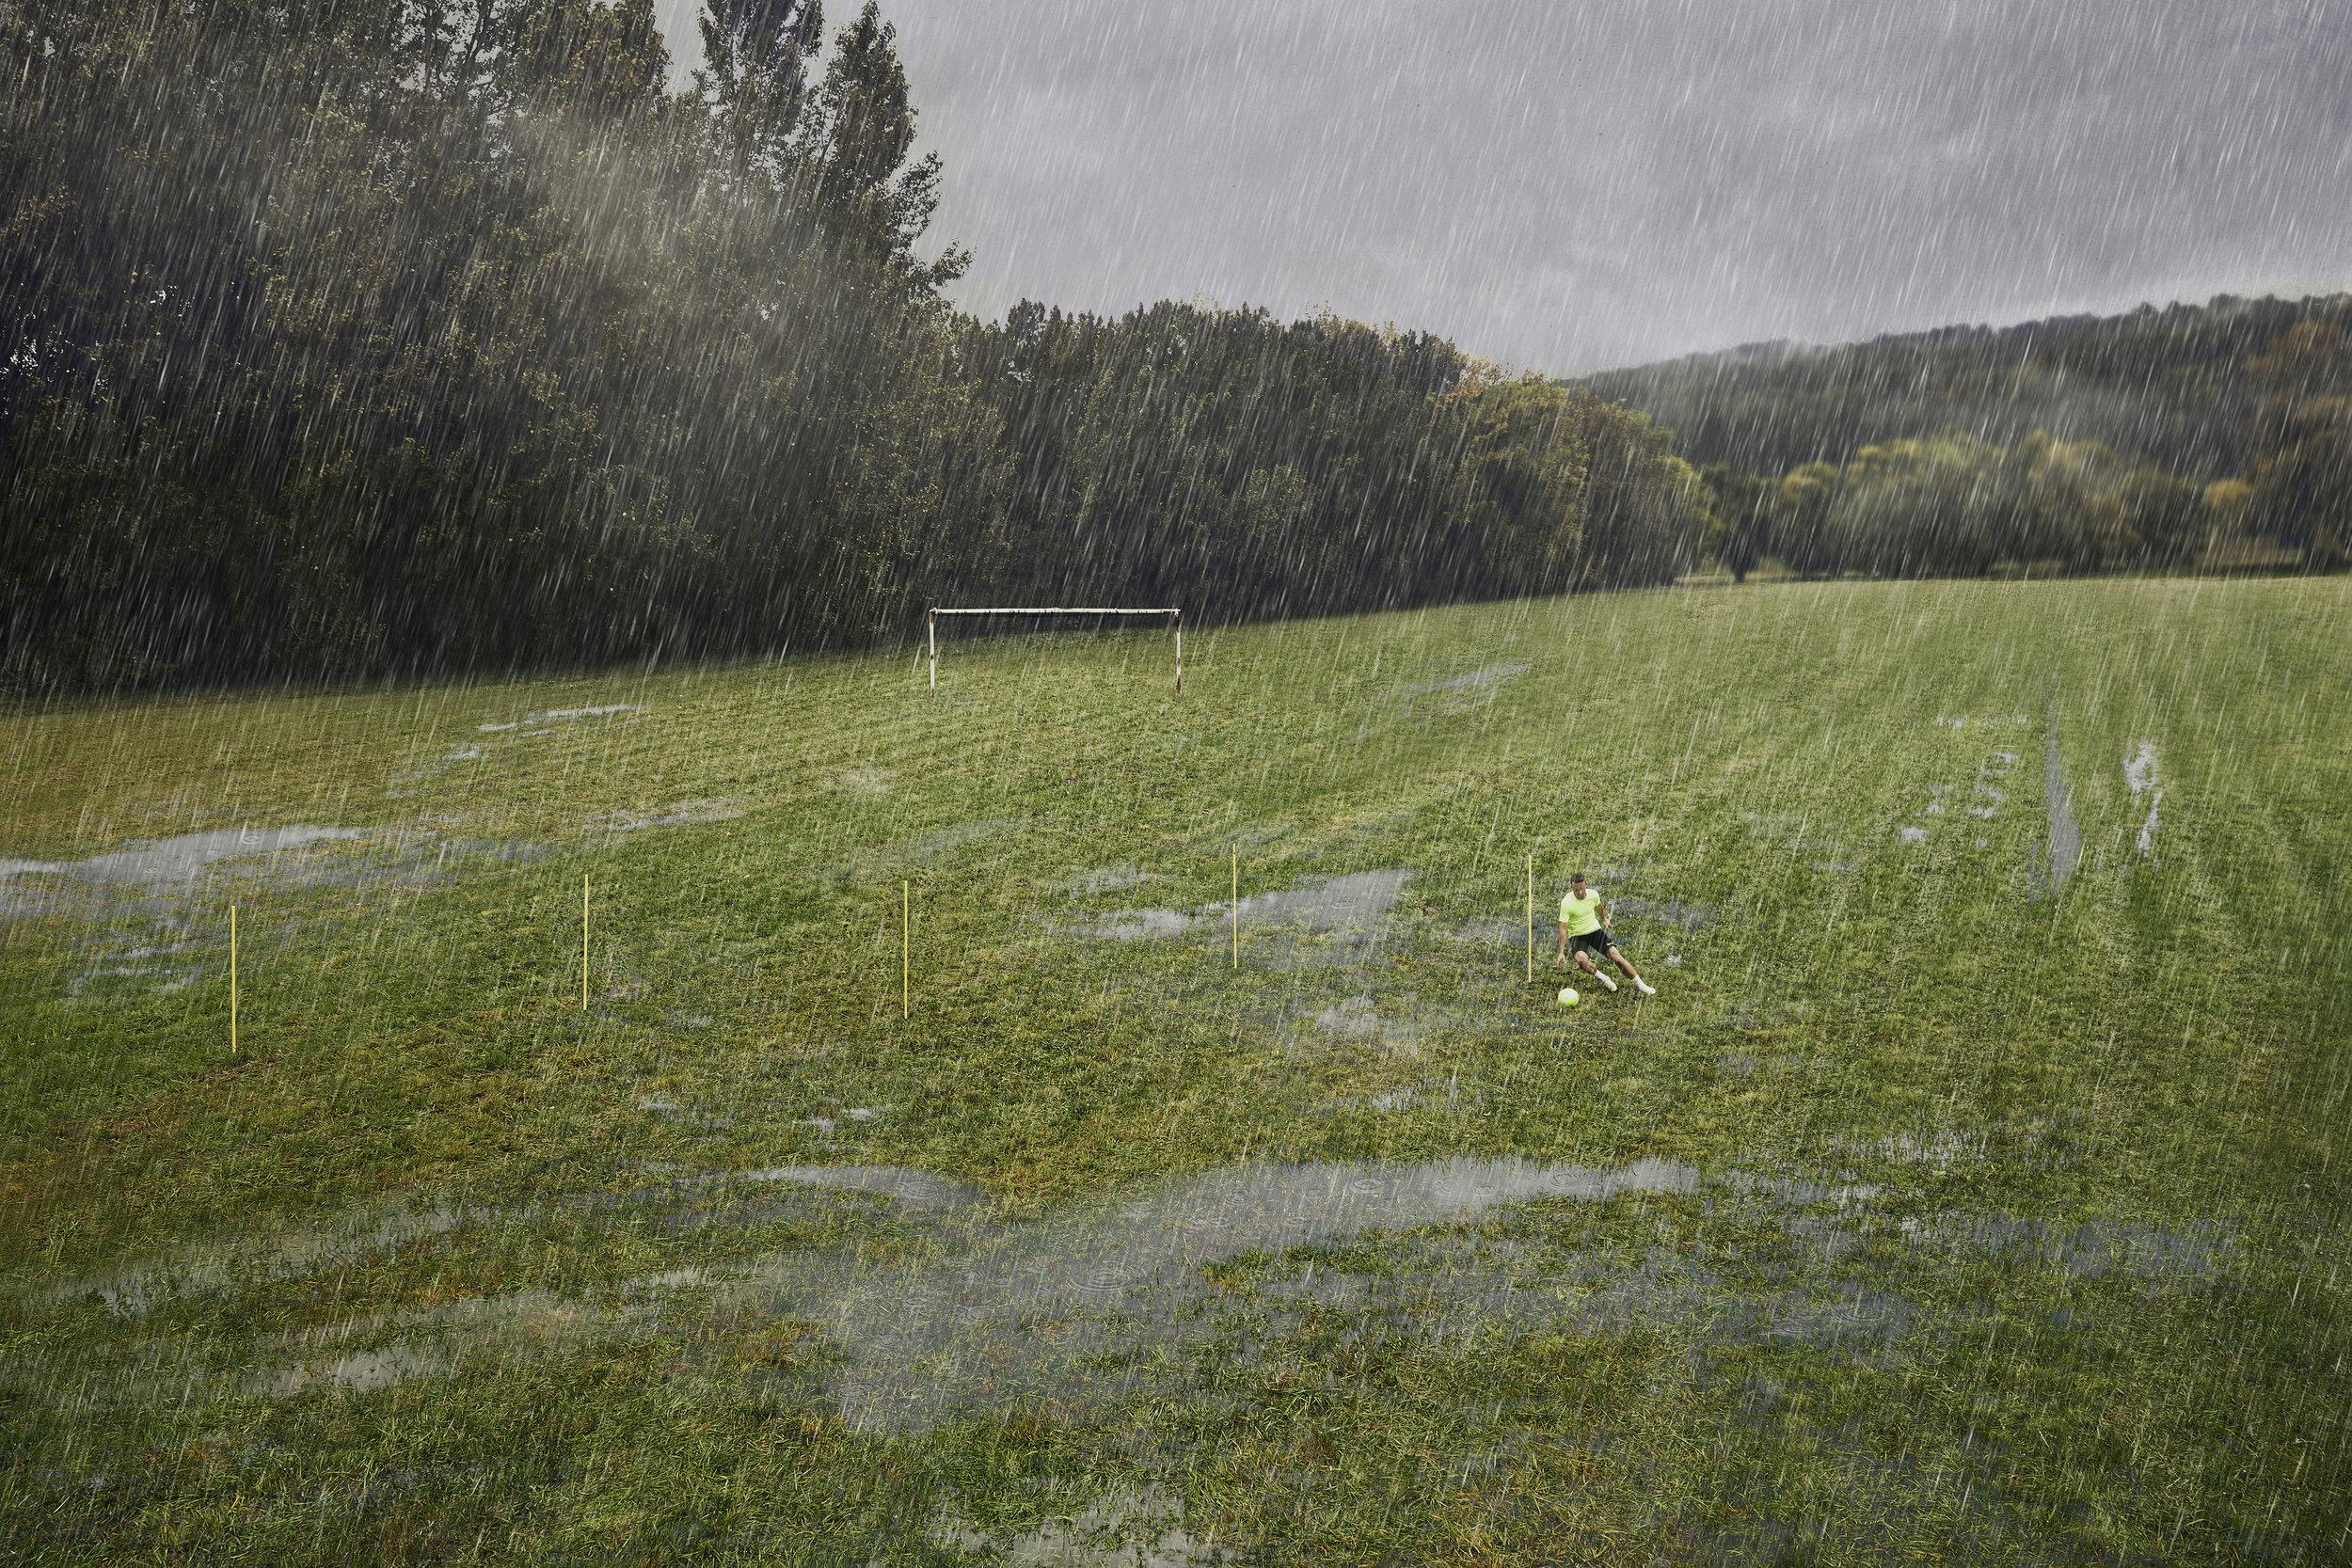 SP15_Rain_Tiempo_Action_0216_V5_AFTER.jpg